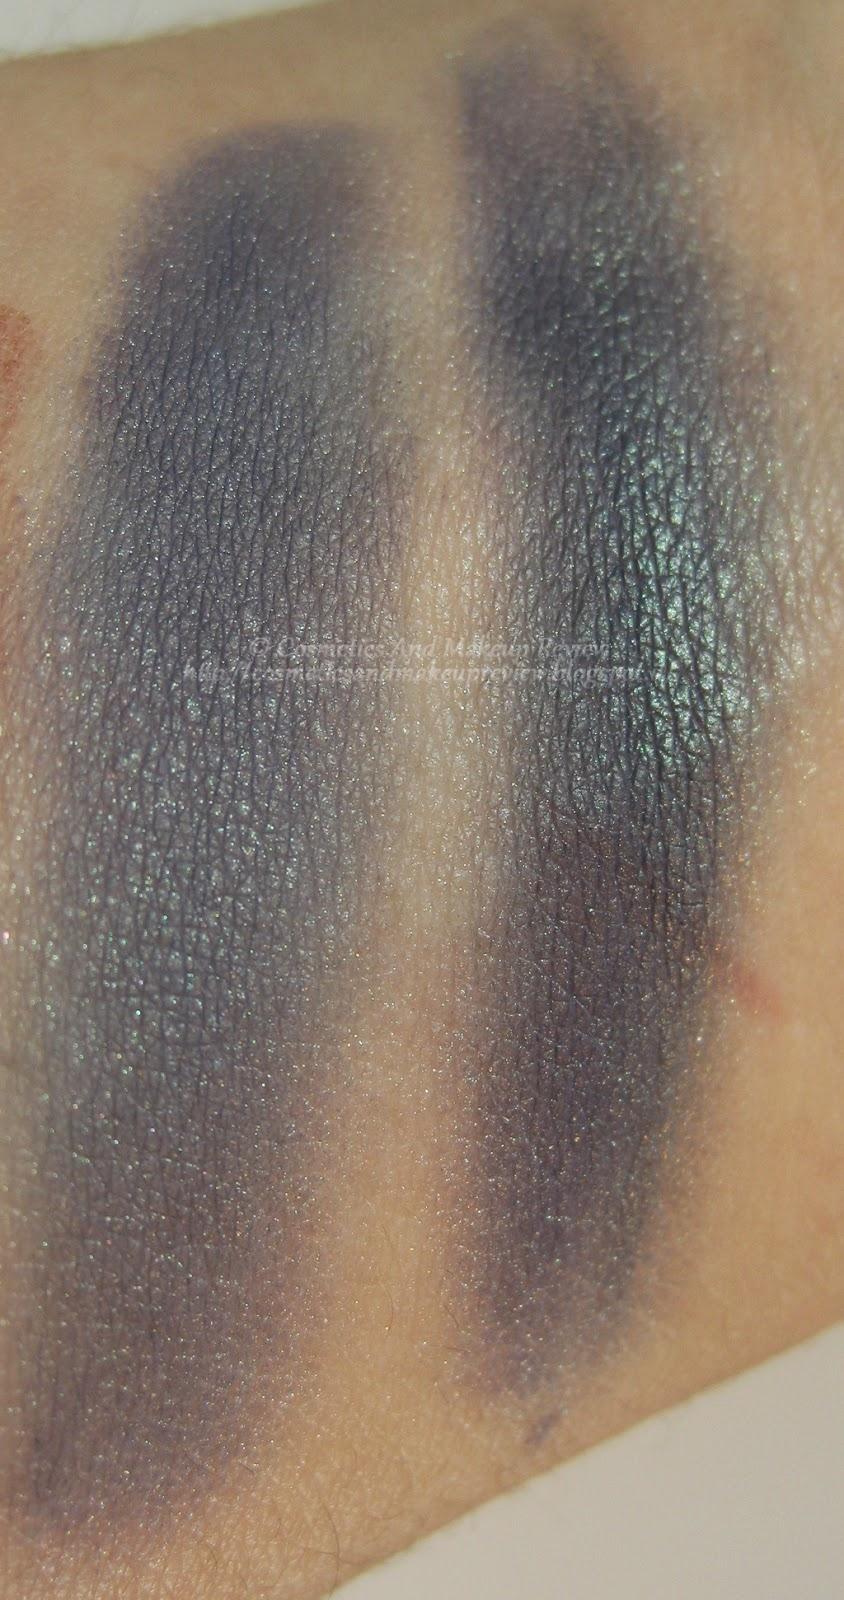 Neve Cosmetics - Pop Society Collection - Yuppie swatches asciutto (sx) e bagnato (dx)